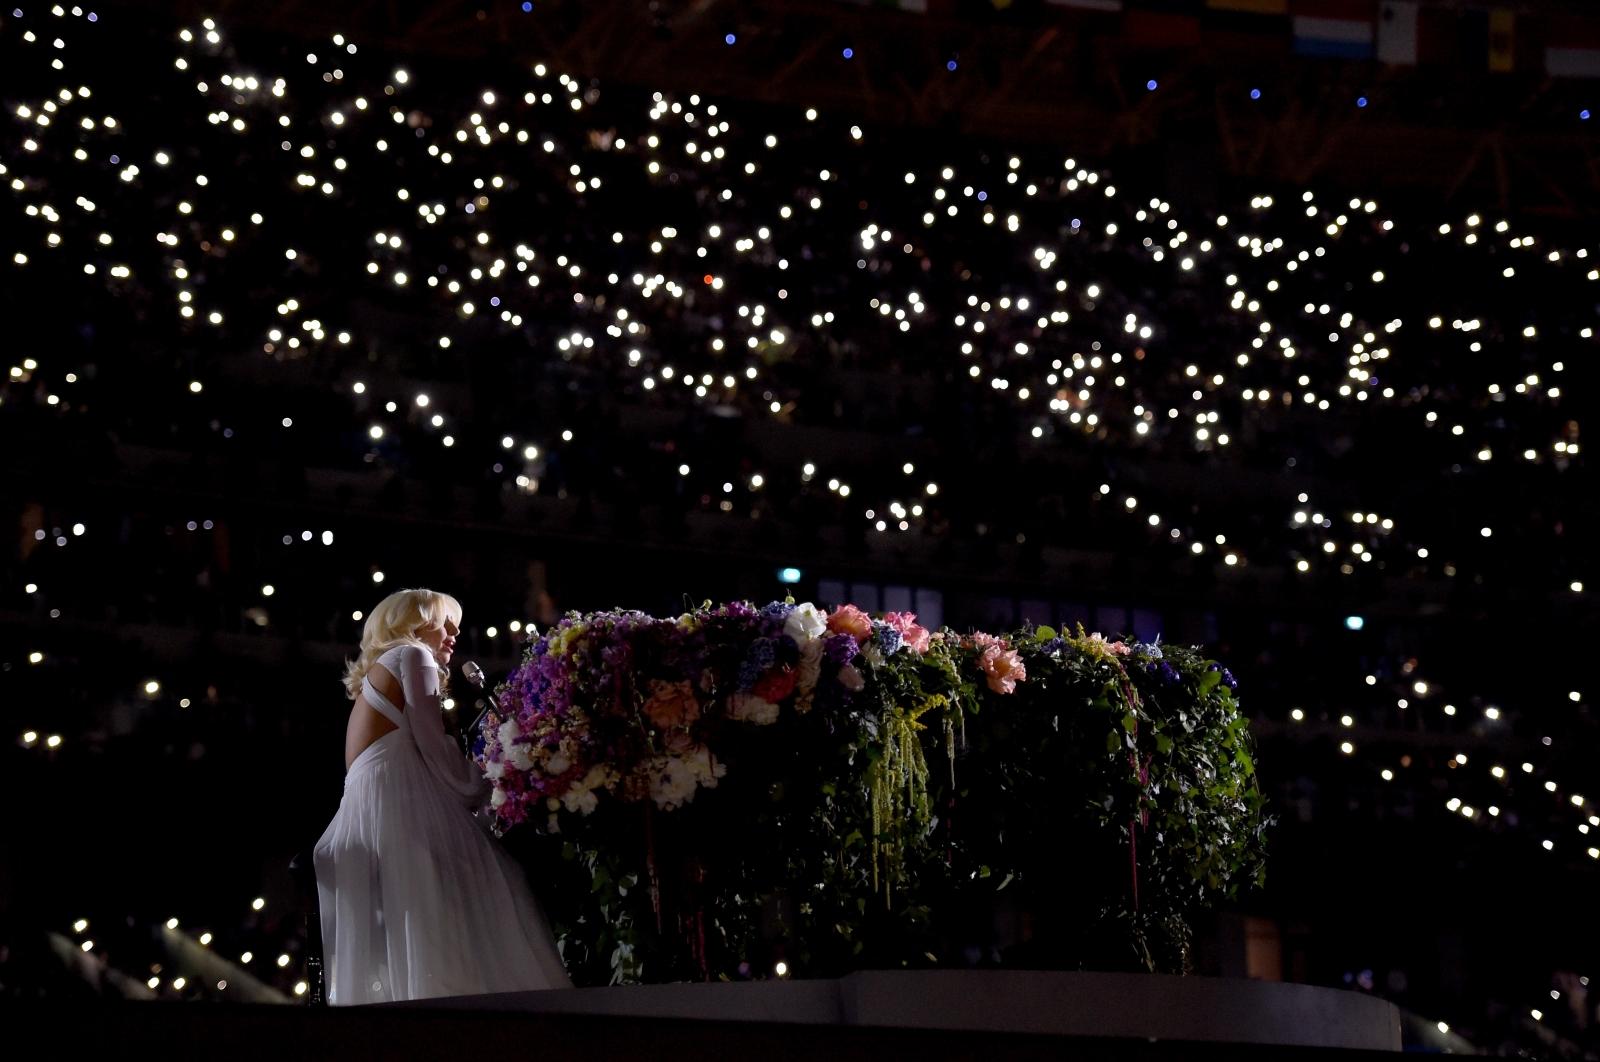 Lady Gaga Baku 2015 Azerbaijan